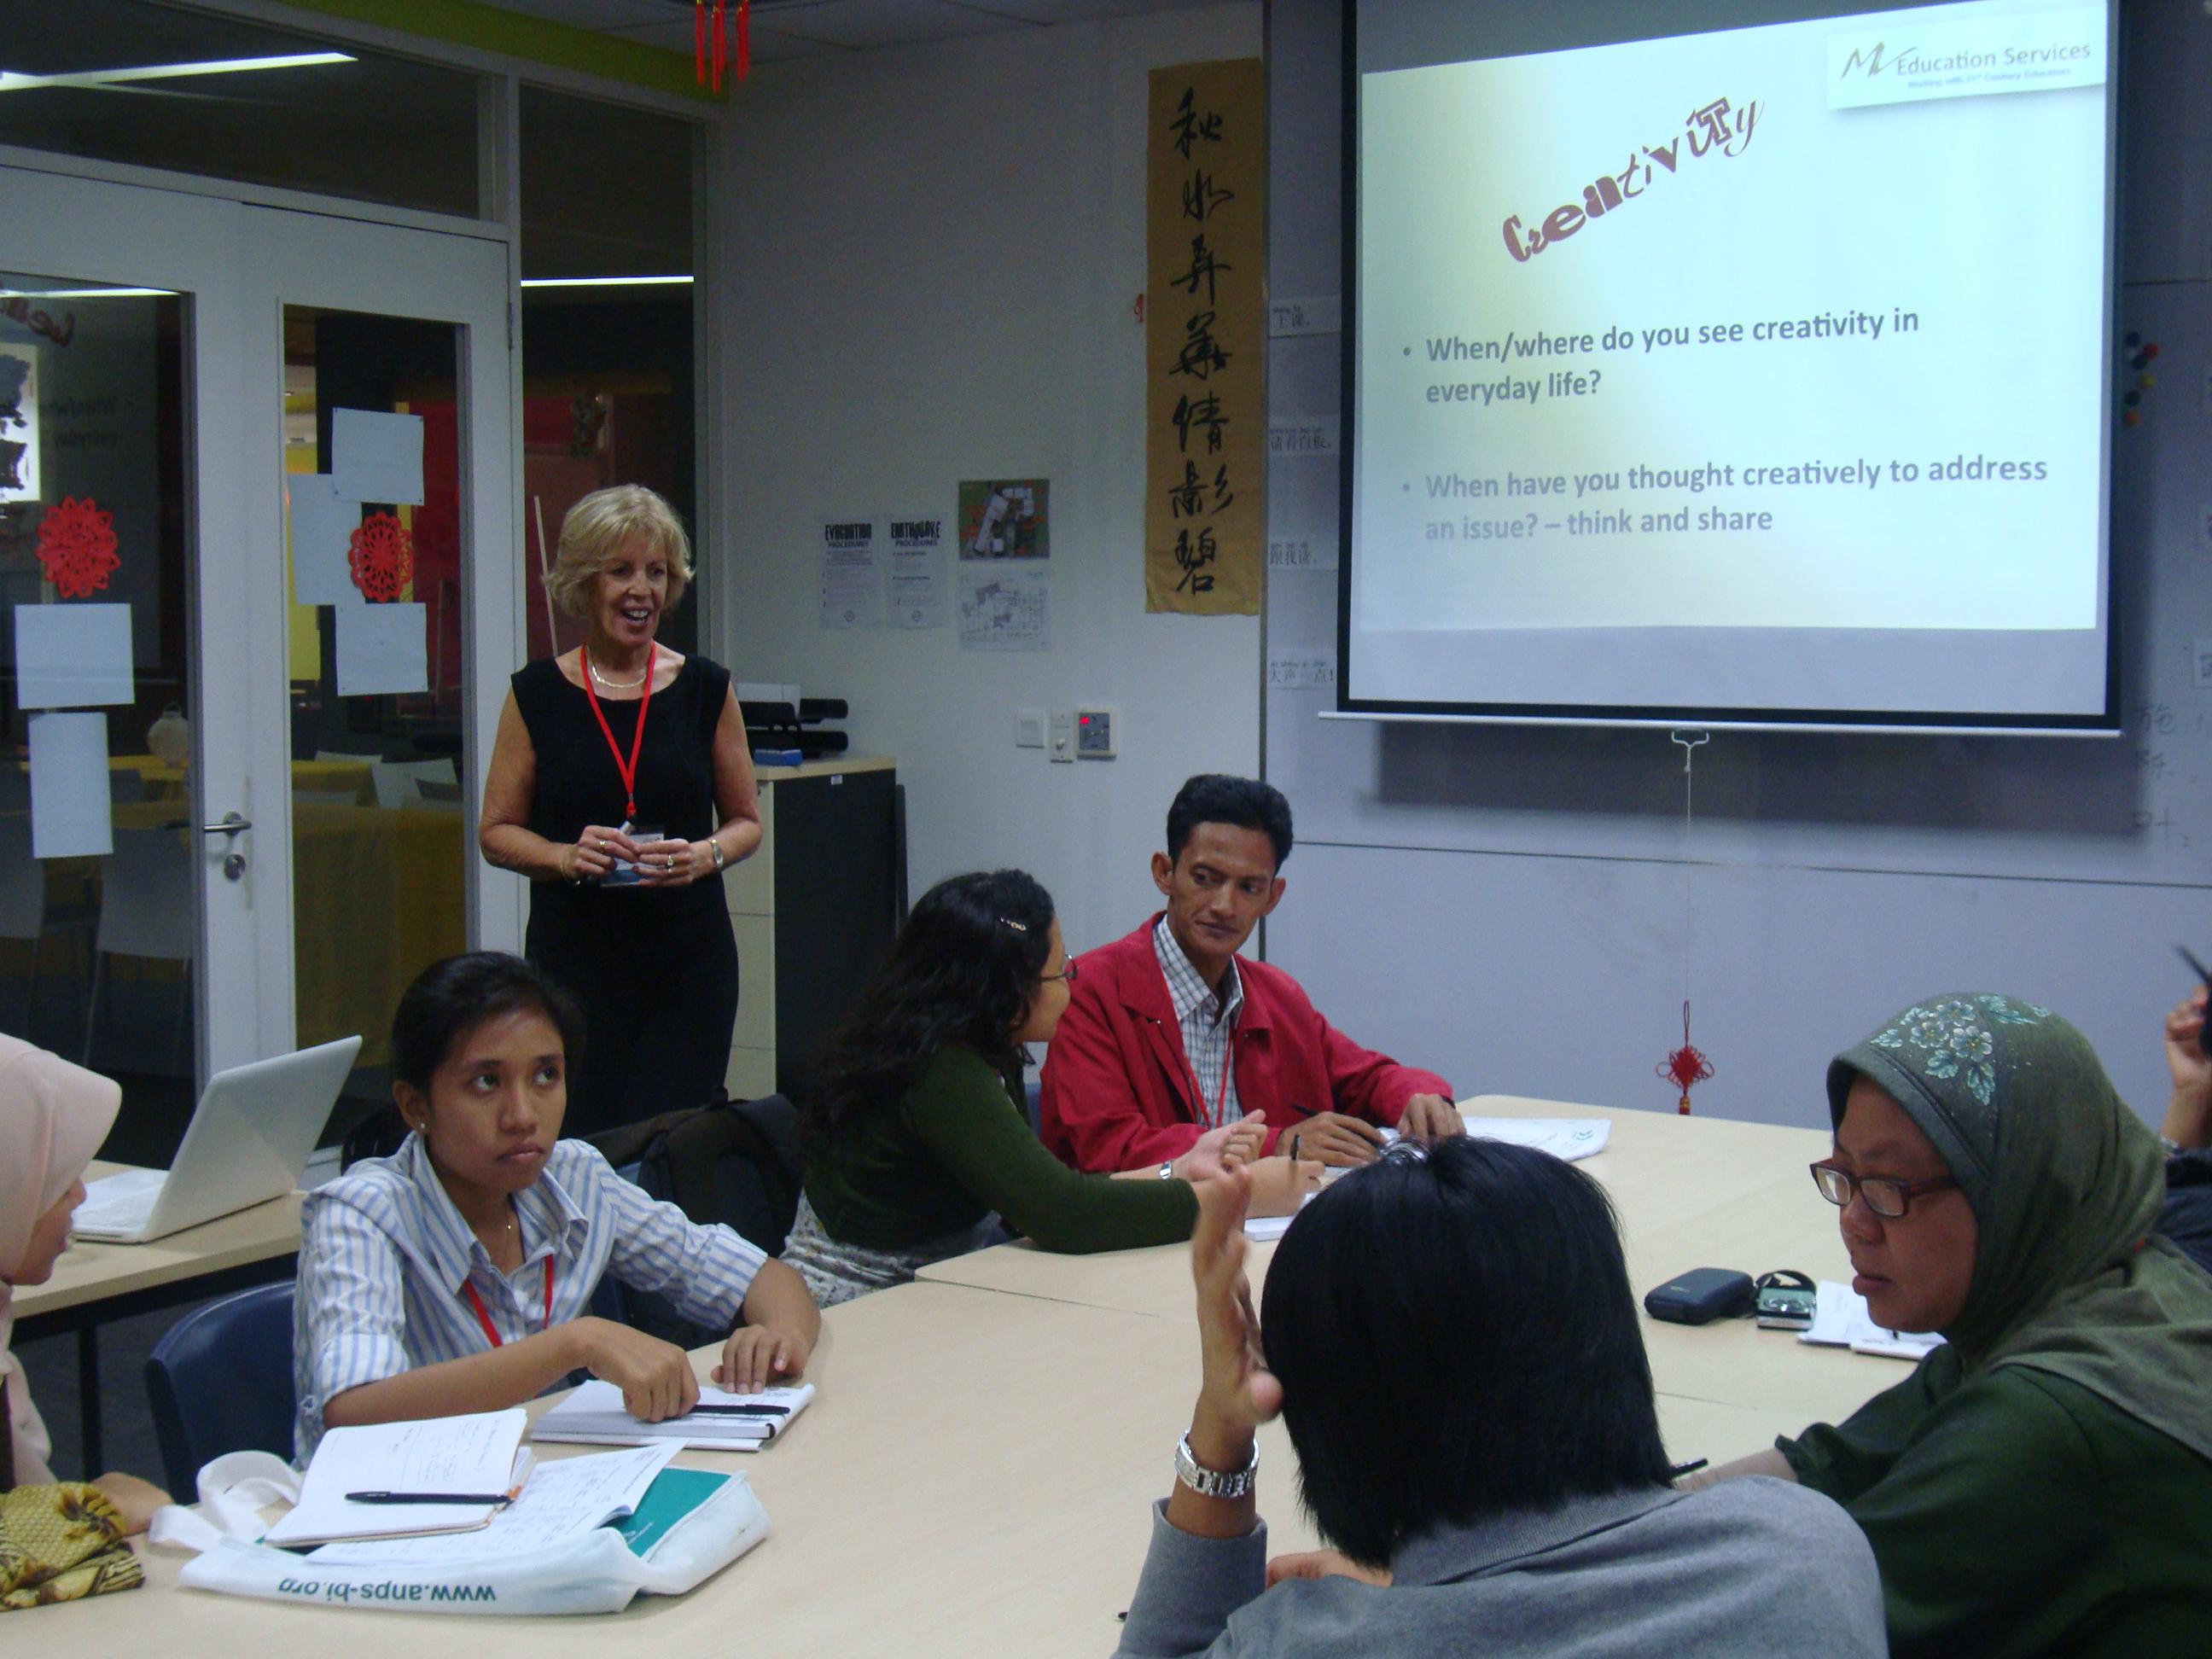 teachers-conference_creativity-across-therriculum